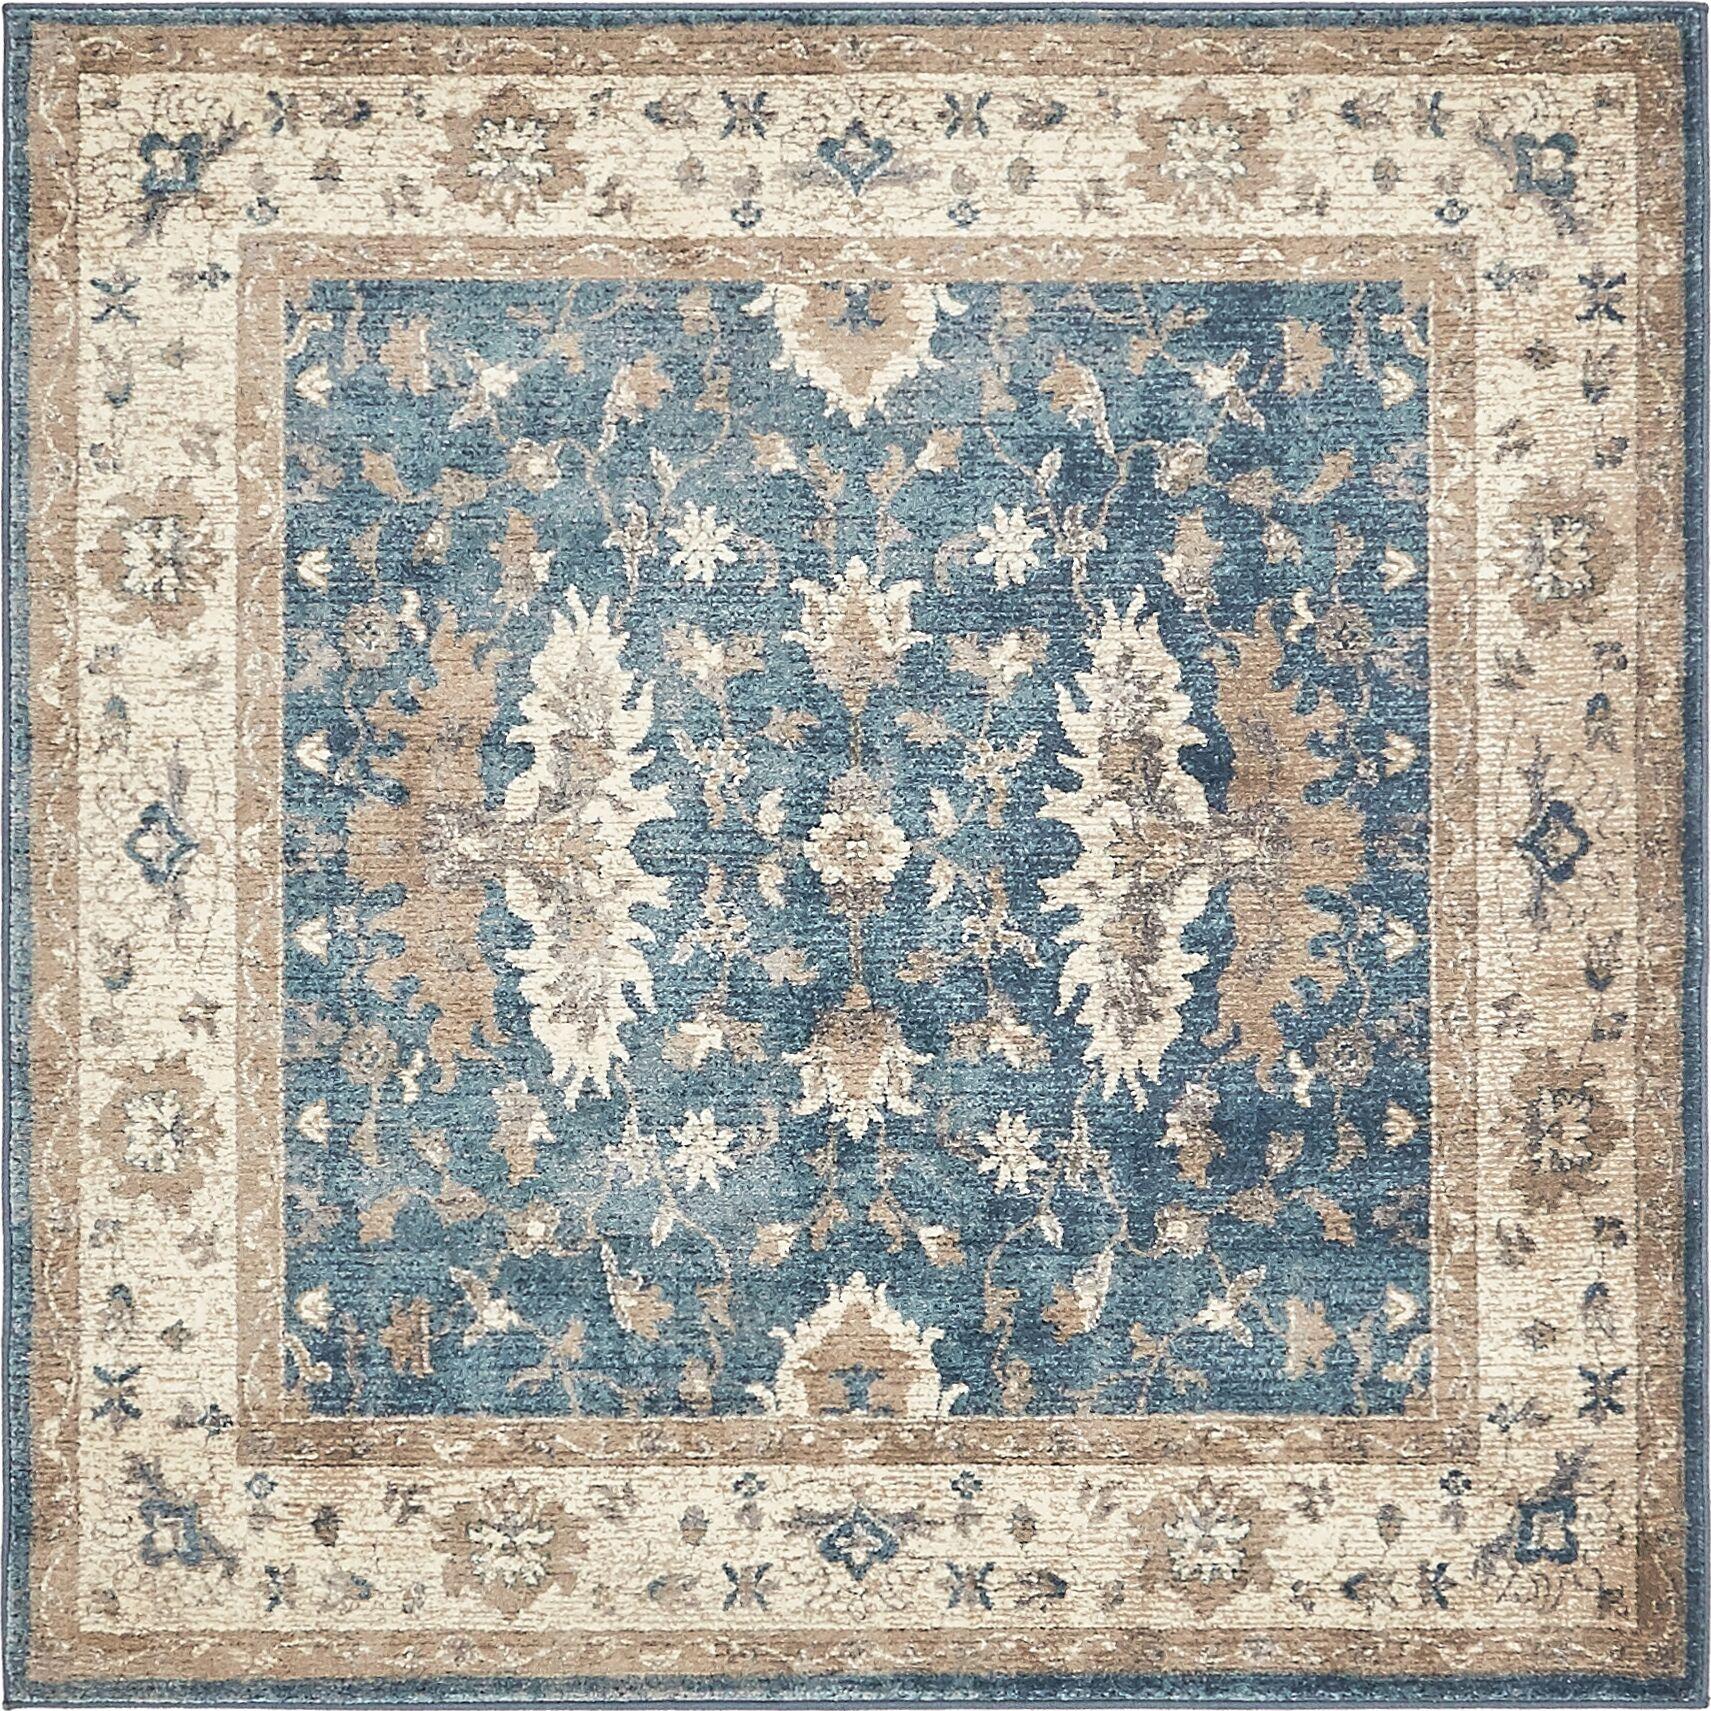 KerensaLight Blue Area Rug Rug Size: Square 5'